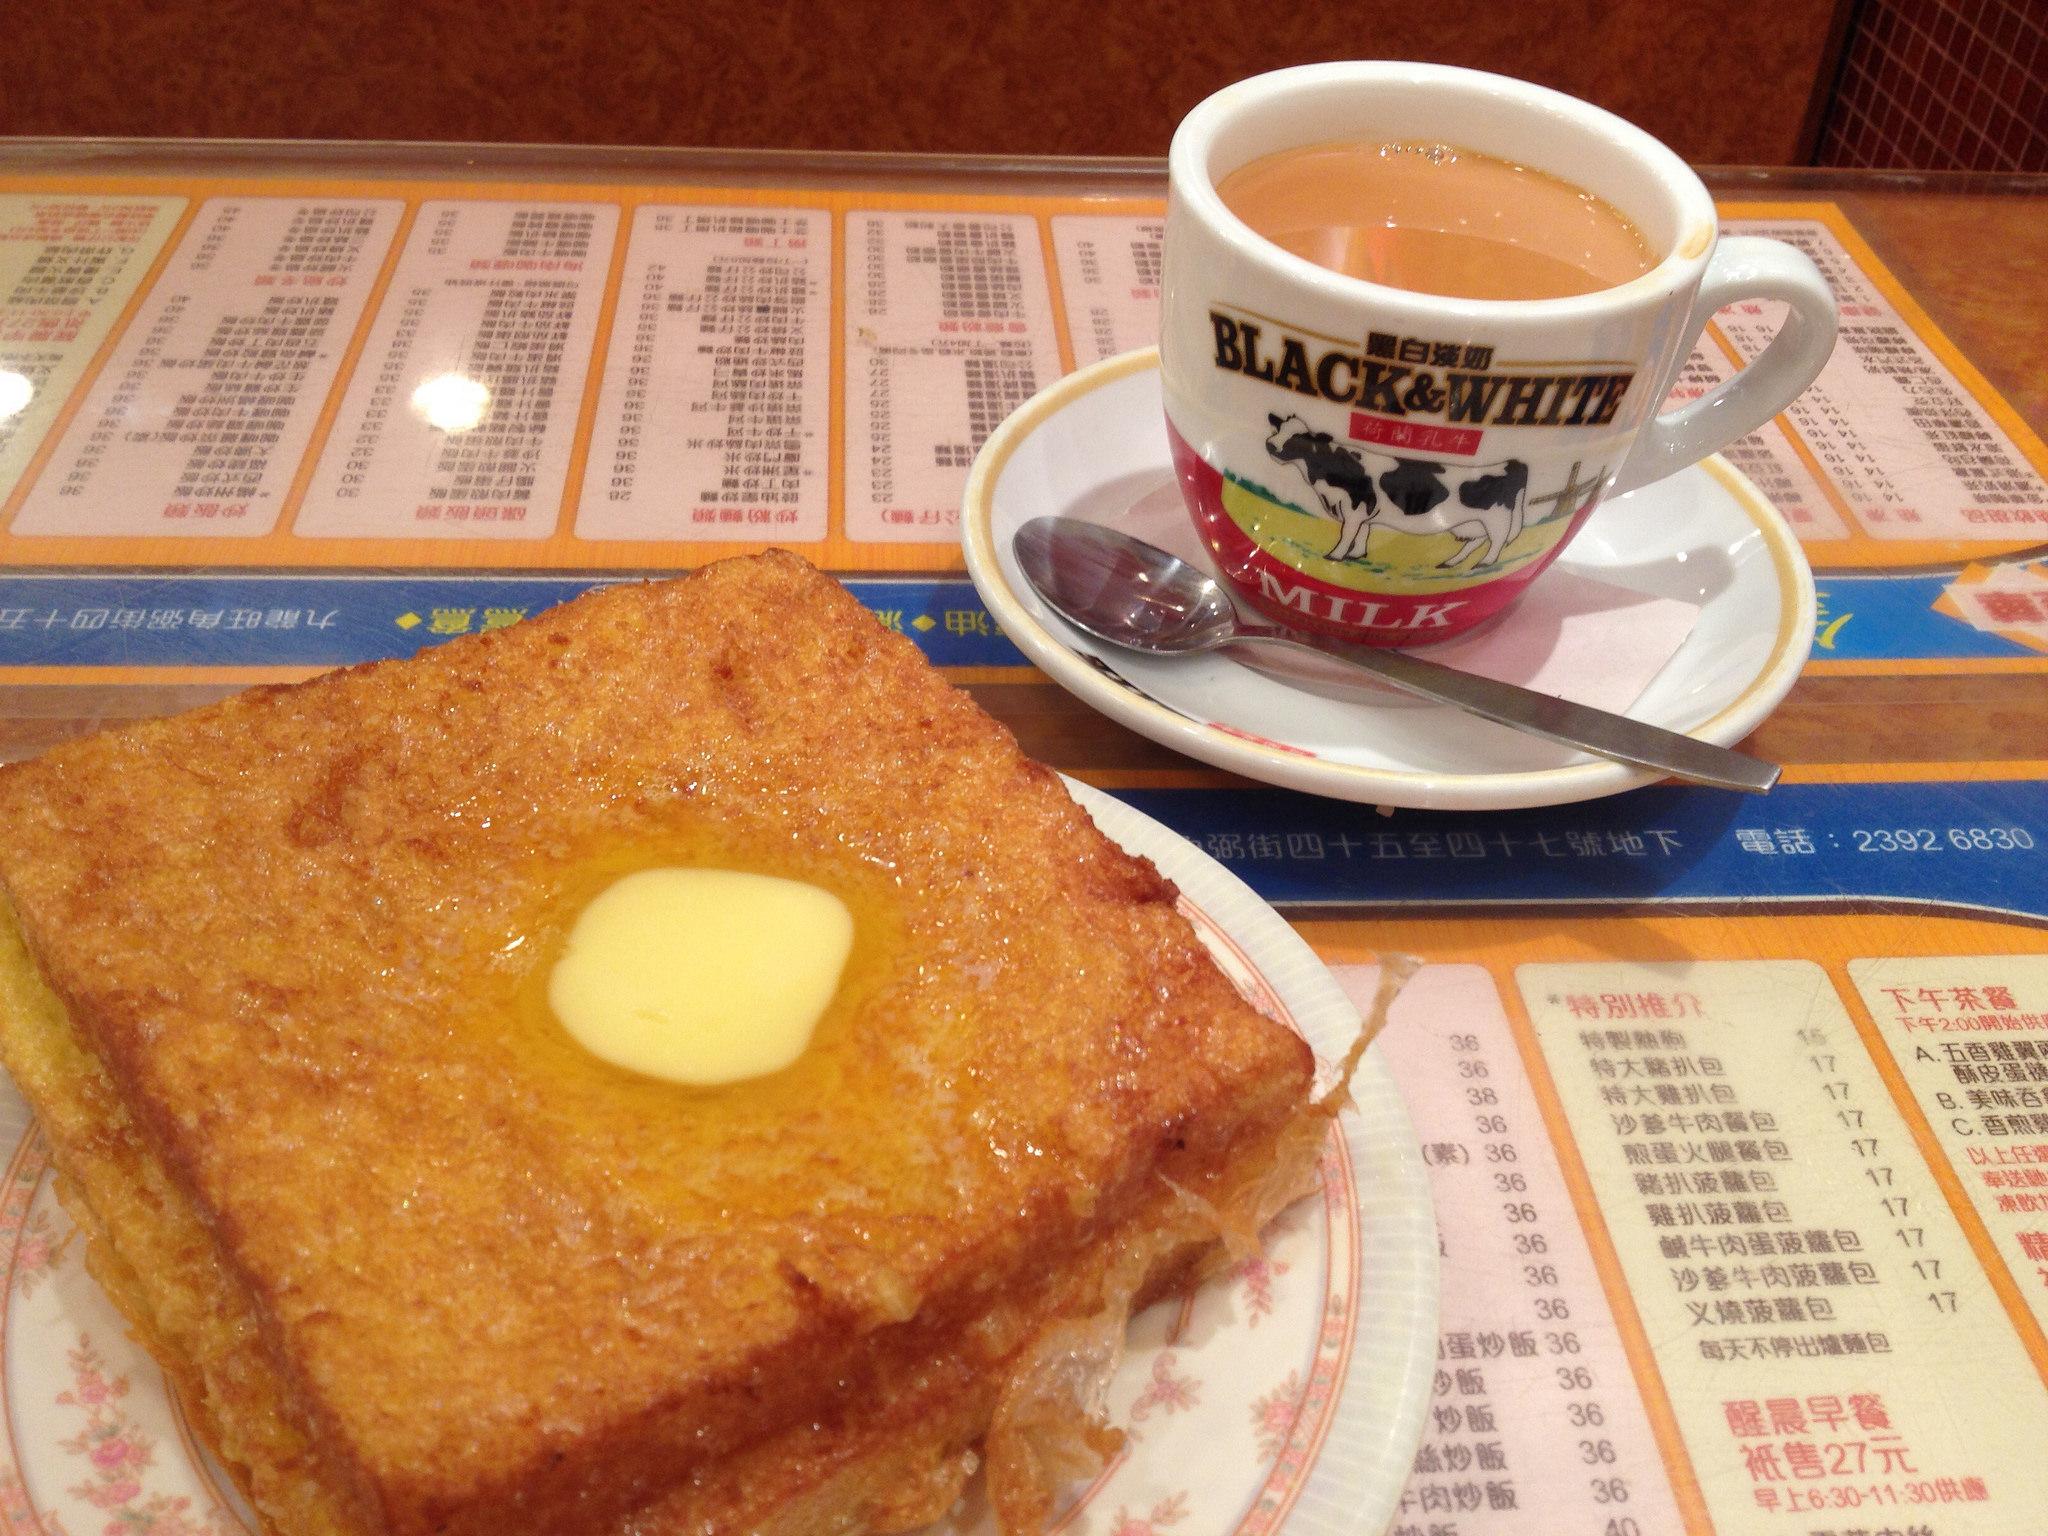 Hong Kong-style French toast and milk tea | © Kansir/Flickr